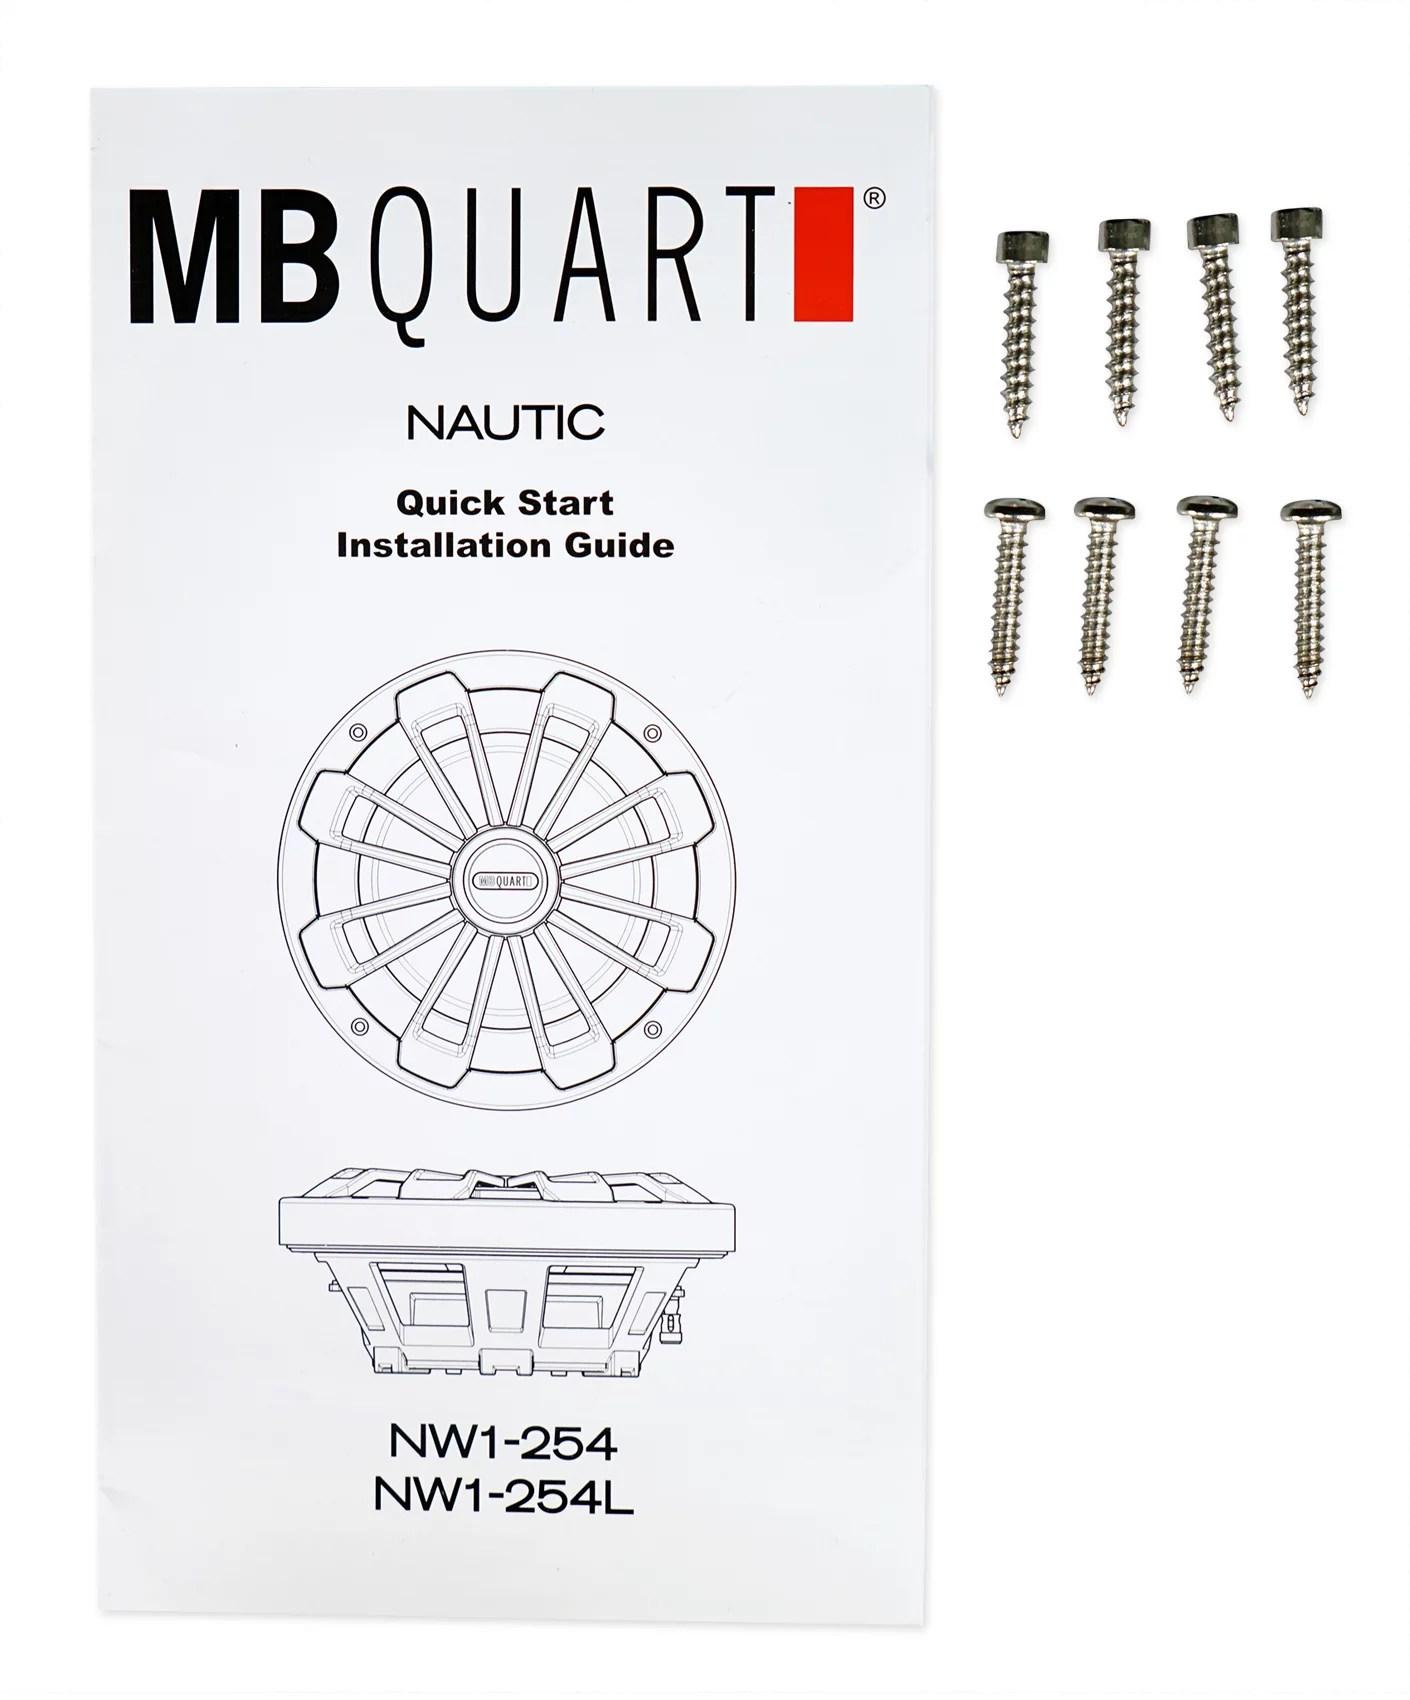 hight resolution of mb quart nw1 254l 10 600w slim marine subwoofer w led s mono amplifier wires walmart com